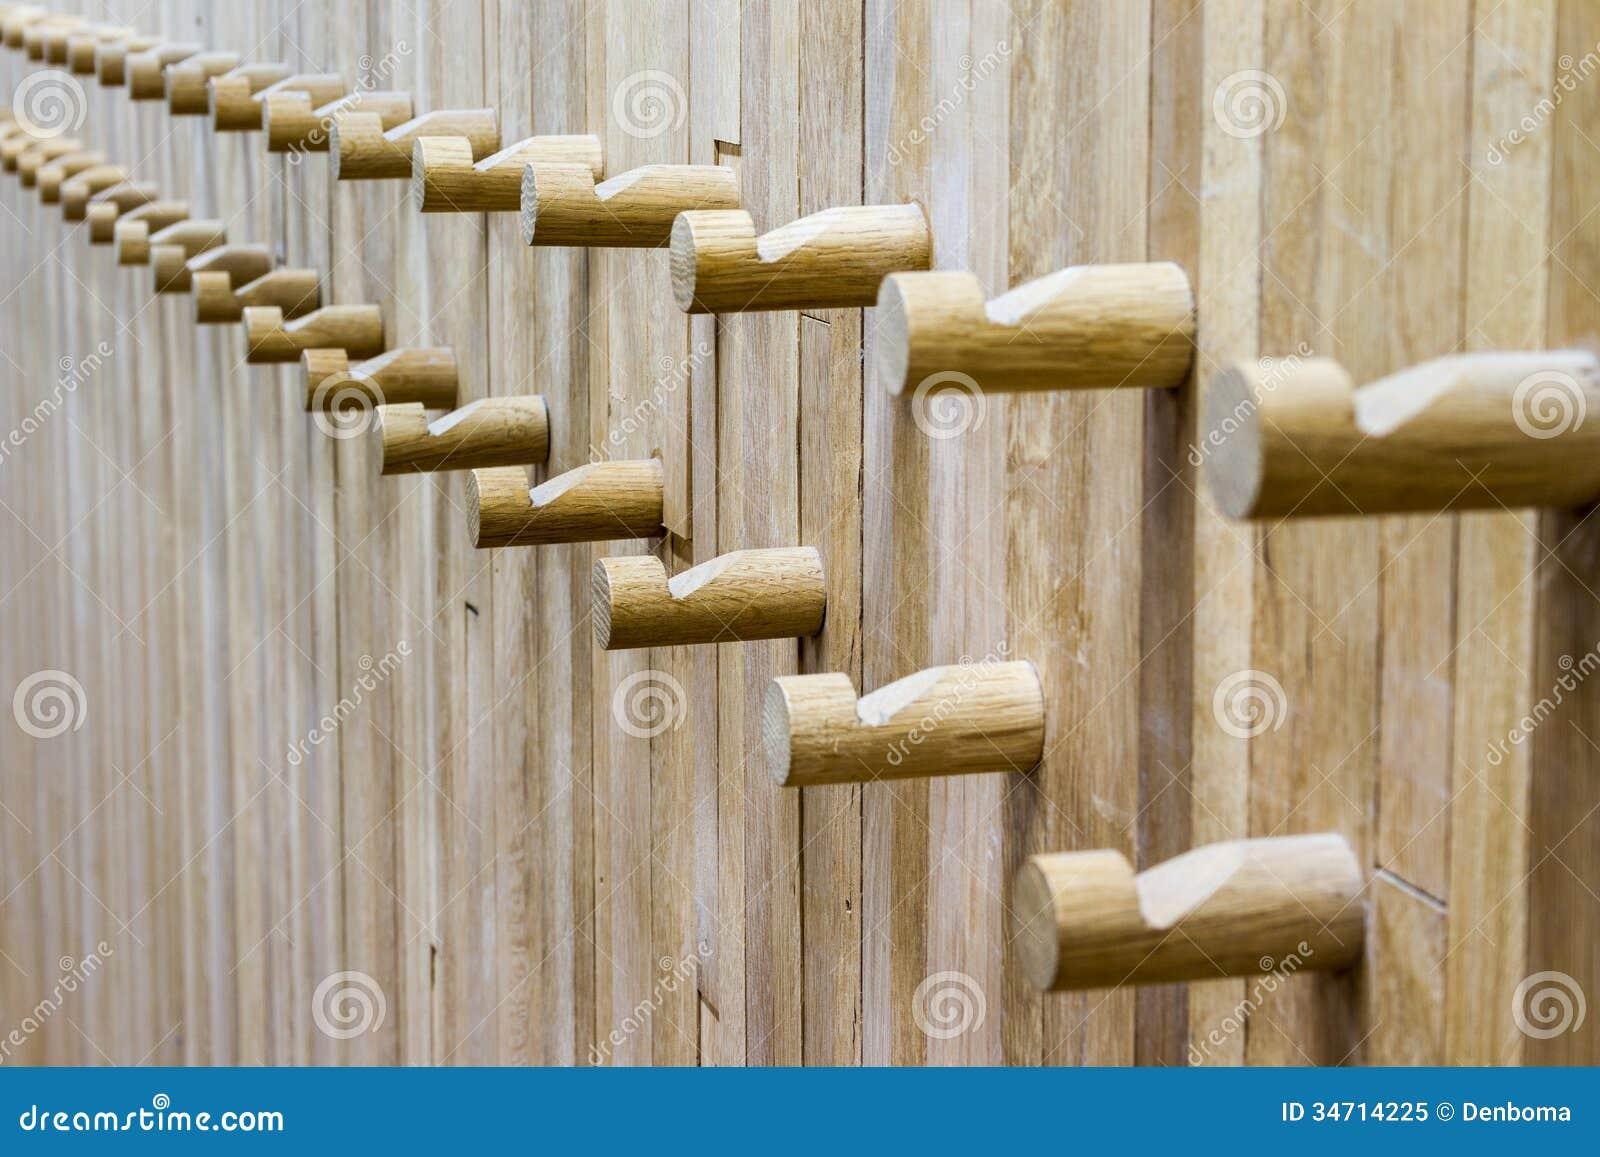 Wooden Coat Rack Royalty Free Stock Photo Image 34714225